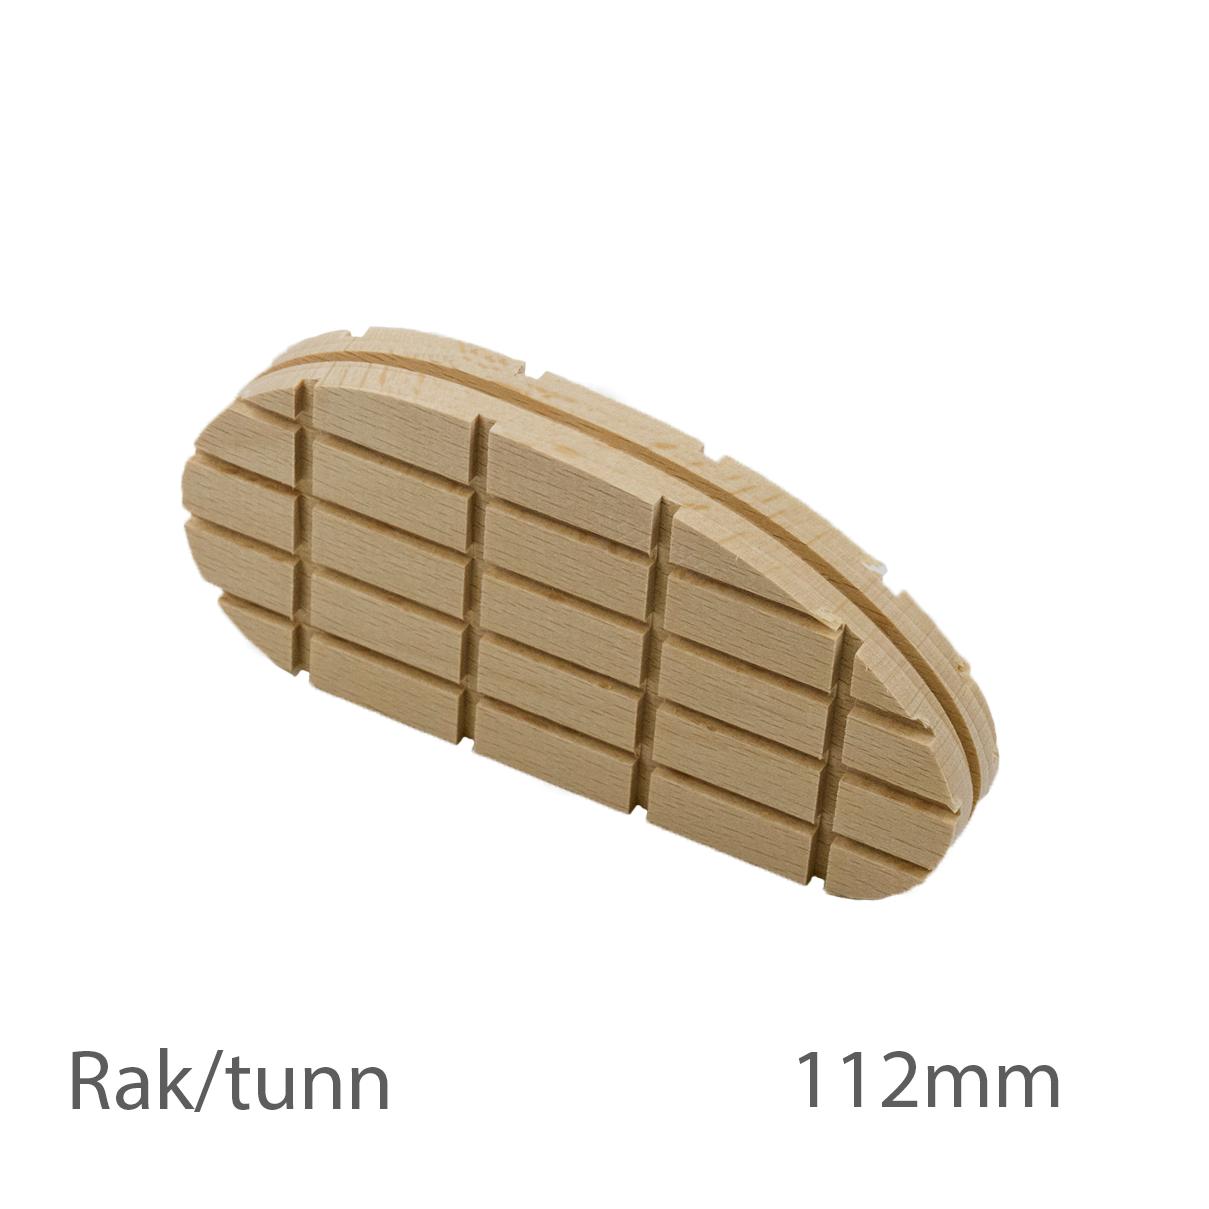 Klövkloss standard tunn, 112 mm